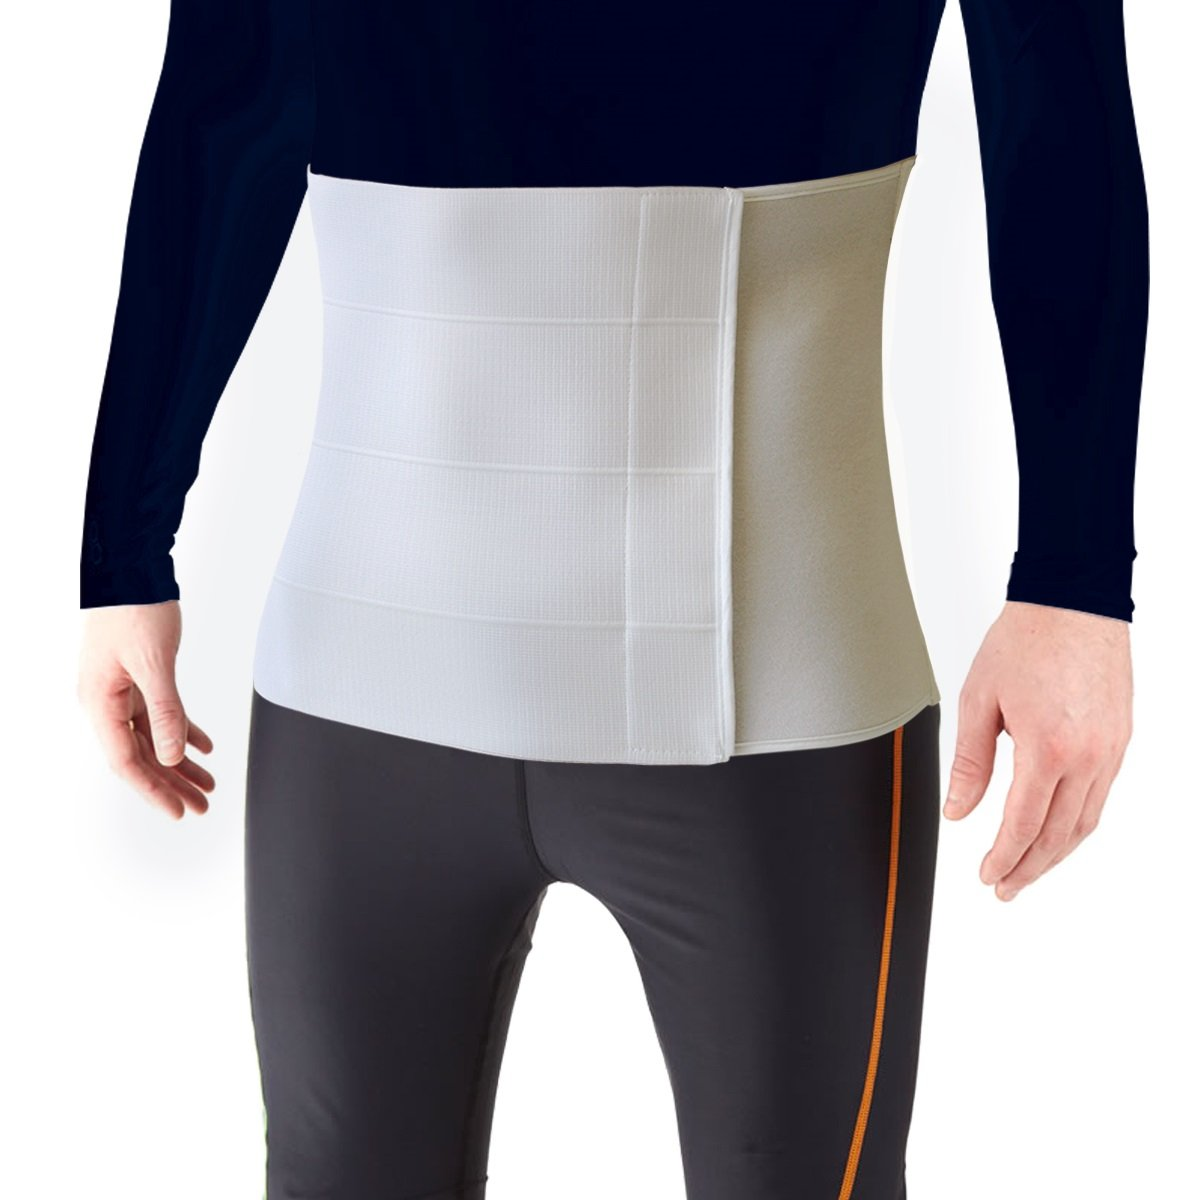 Amazon.com: Most Comfortable Abdominal Binder, Additional